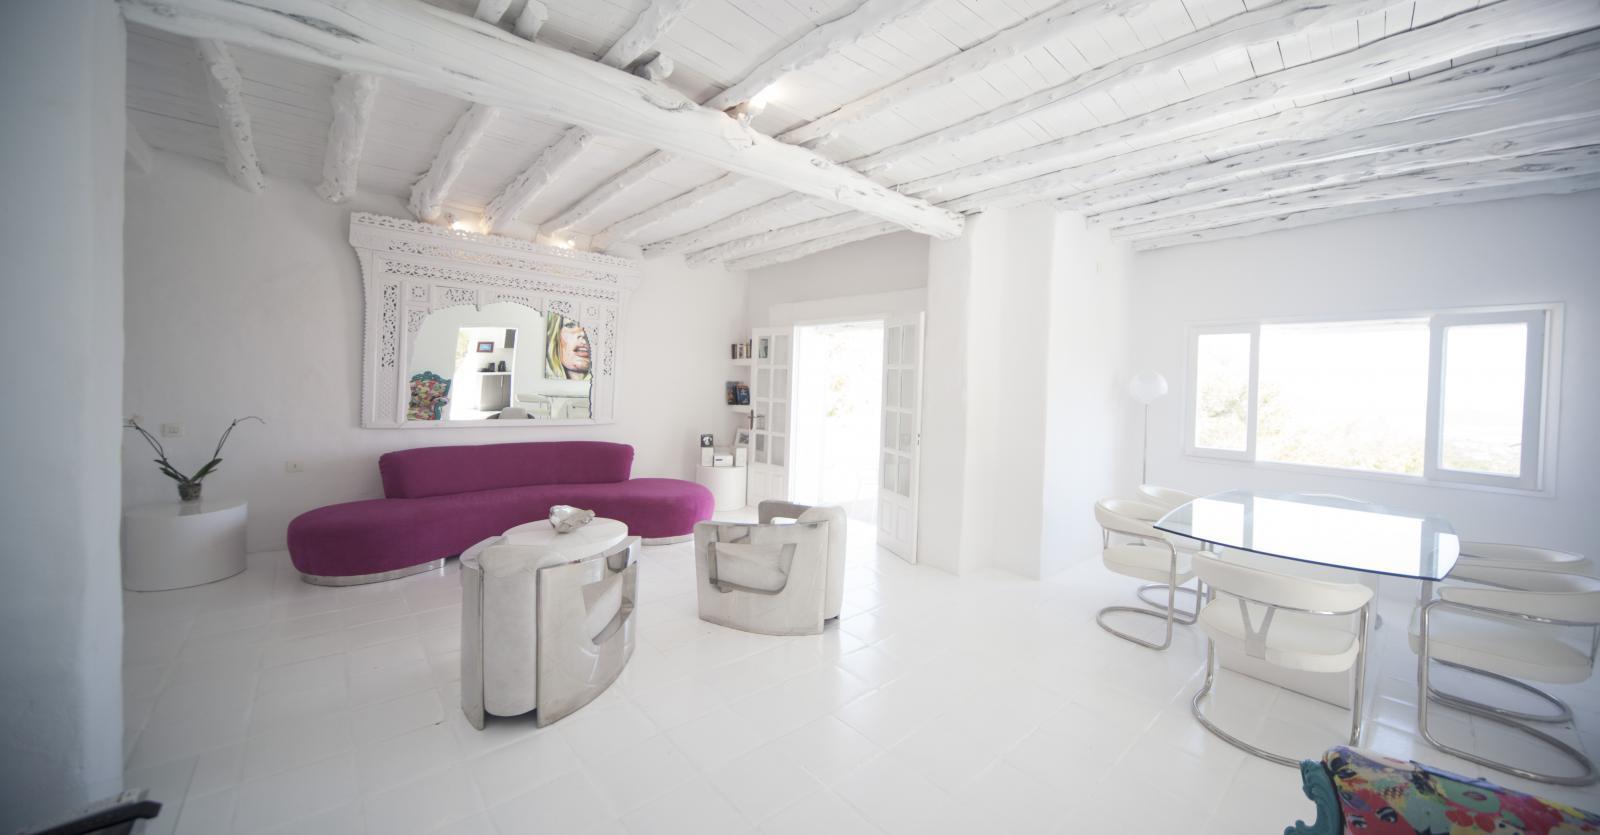 80380389 3171973 foto 709184 - Fusión de estilos decorativos en este trocito de paraiso en Sant Josep de sa Talaia